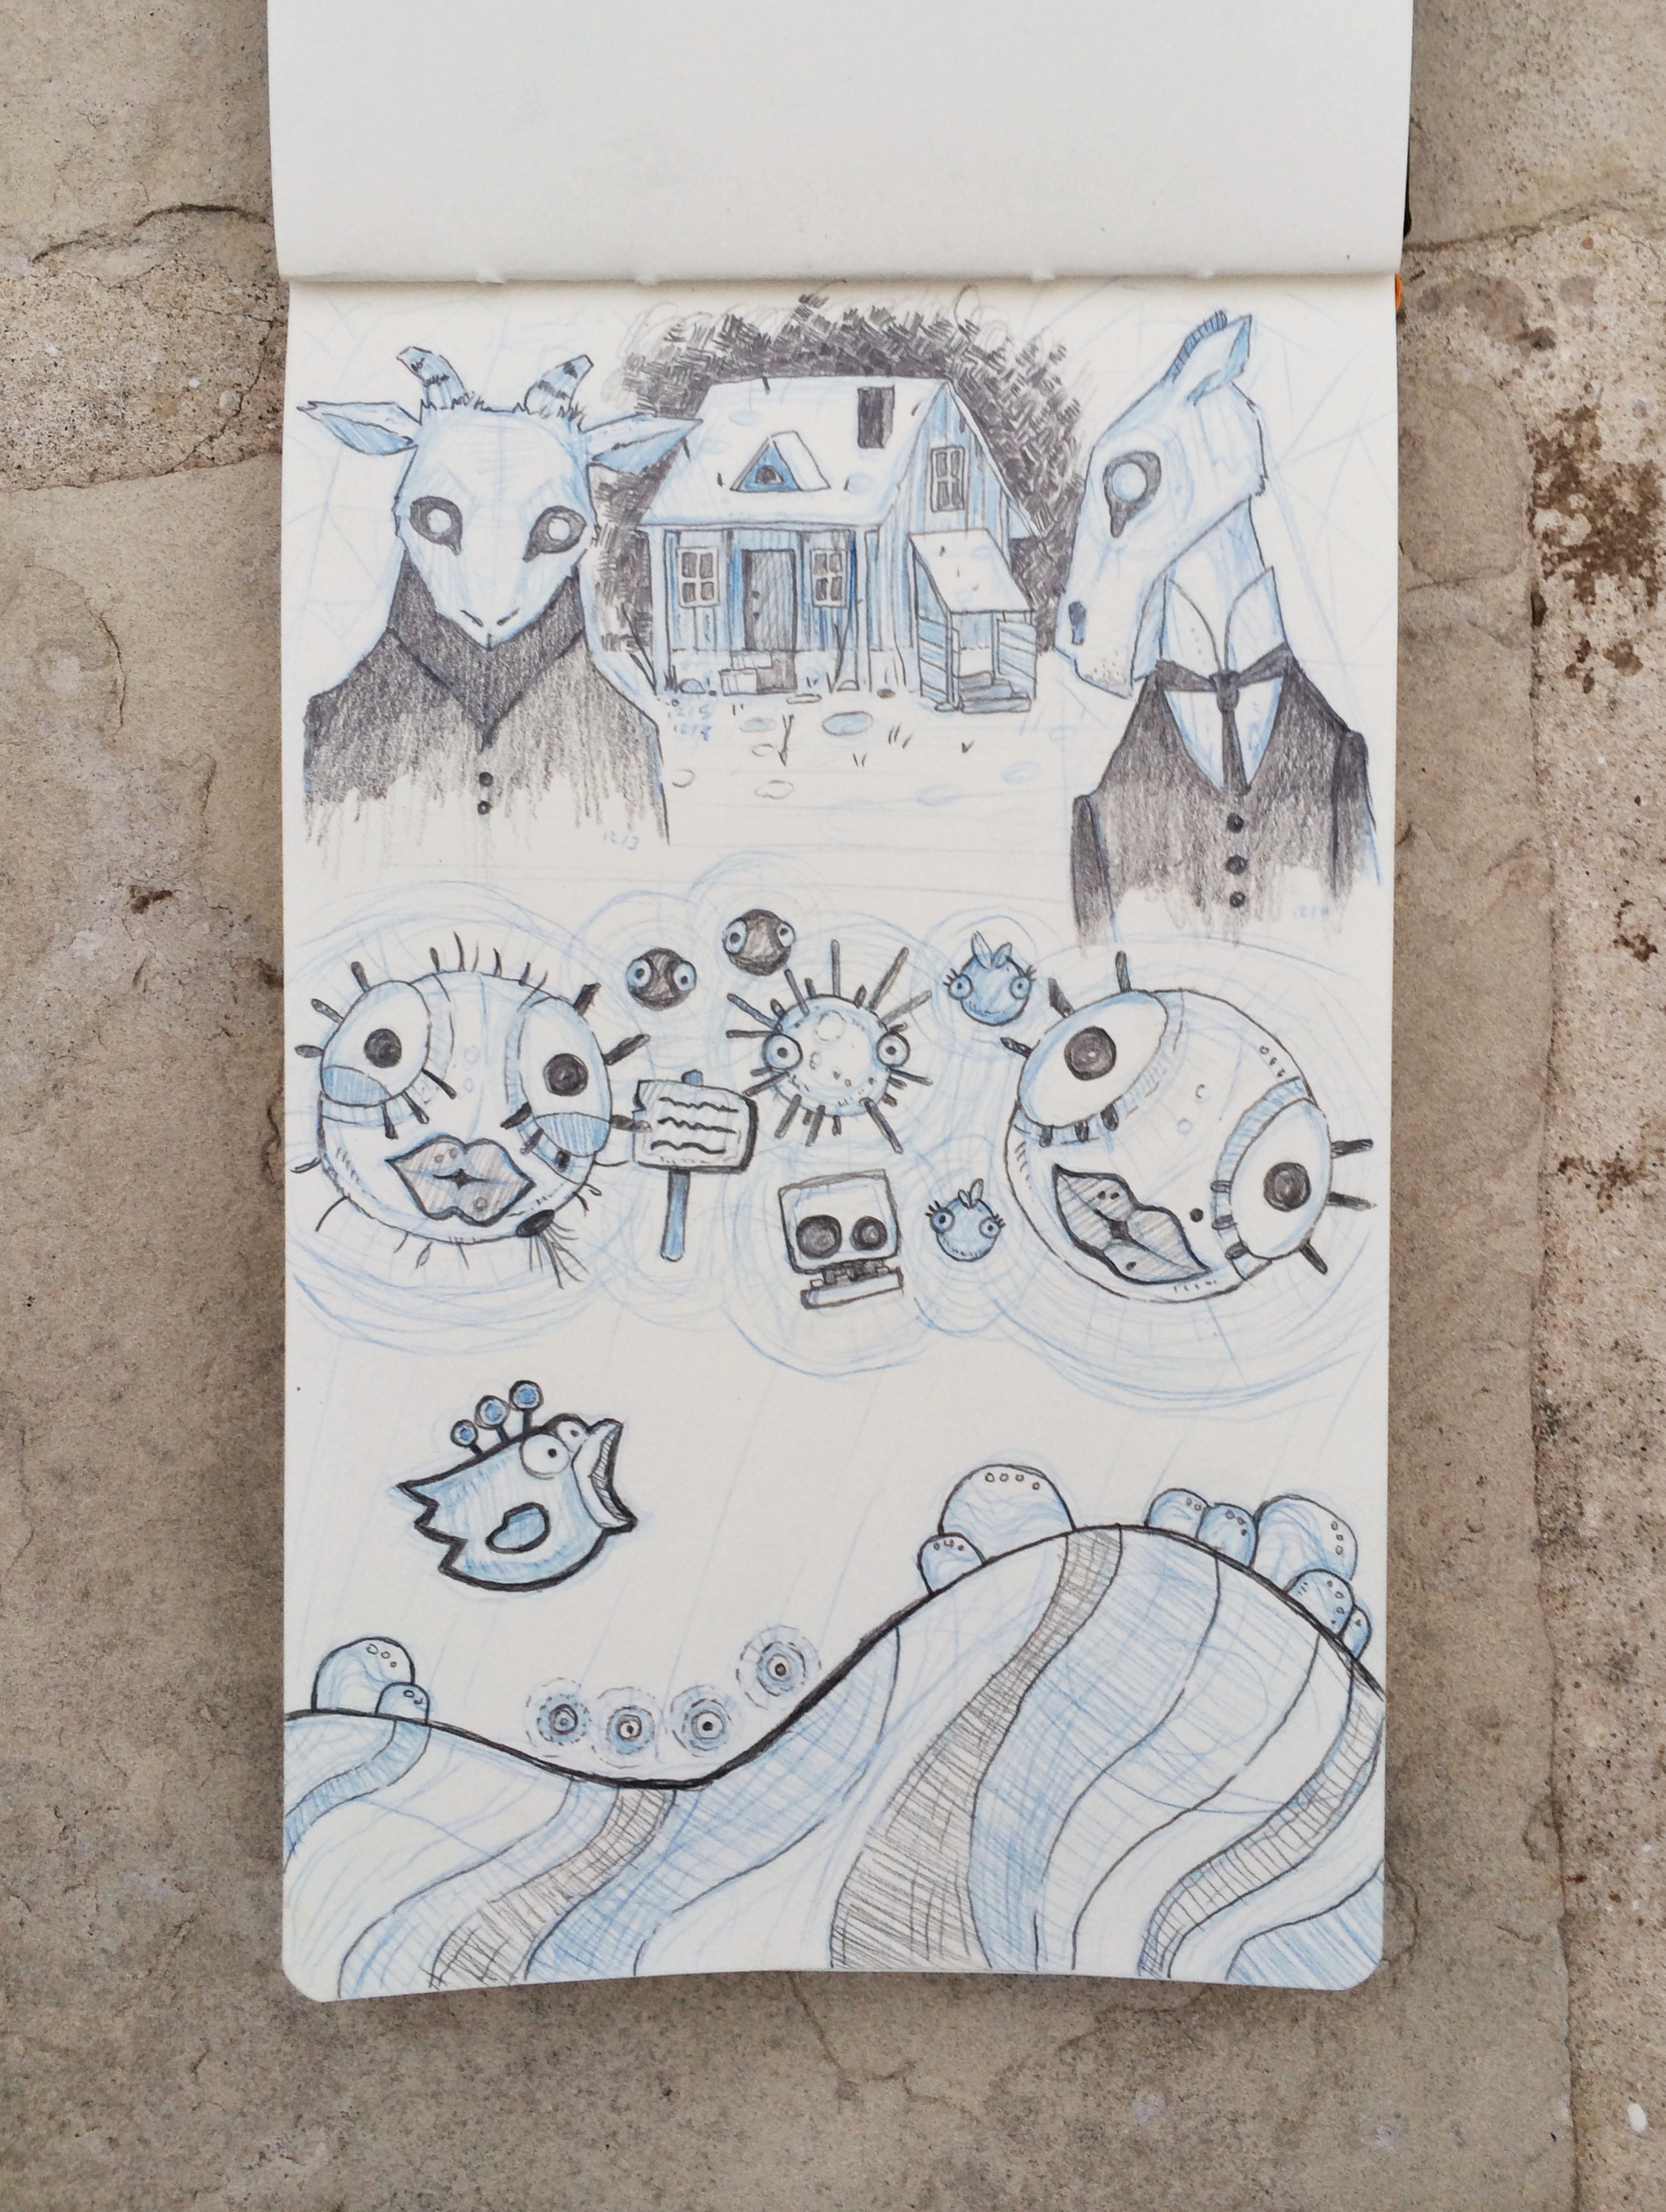 Sketch of favorite iPad games by Chloé Yingst |  chloedraws.com